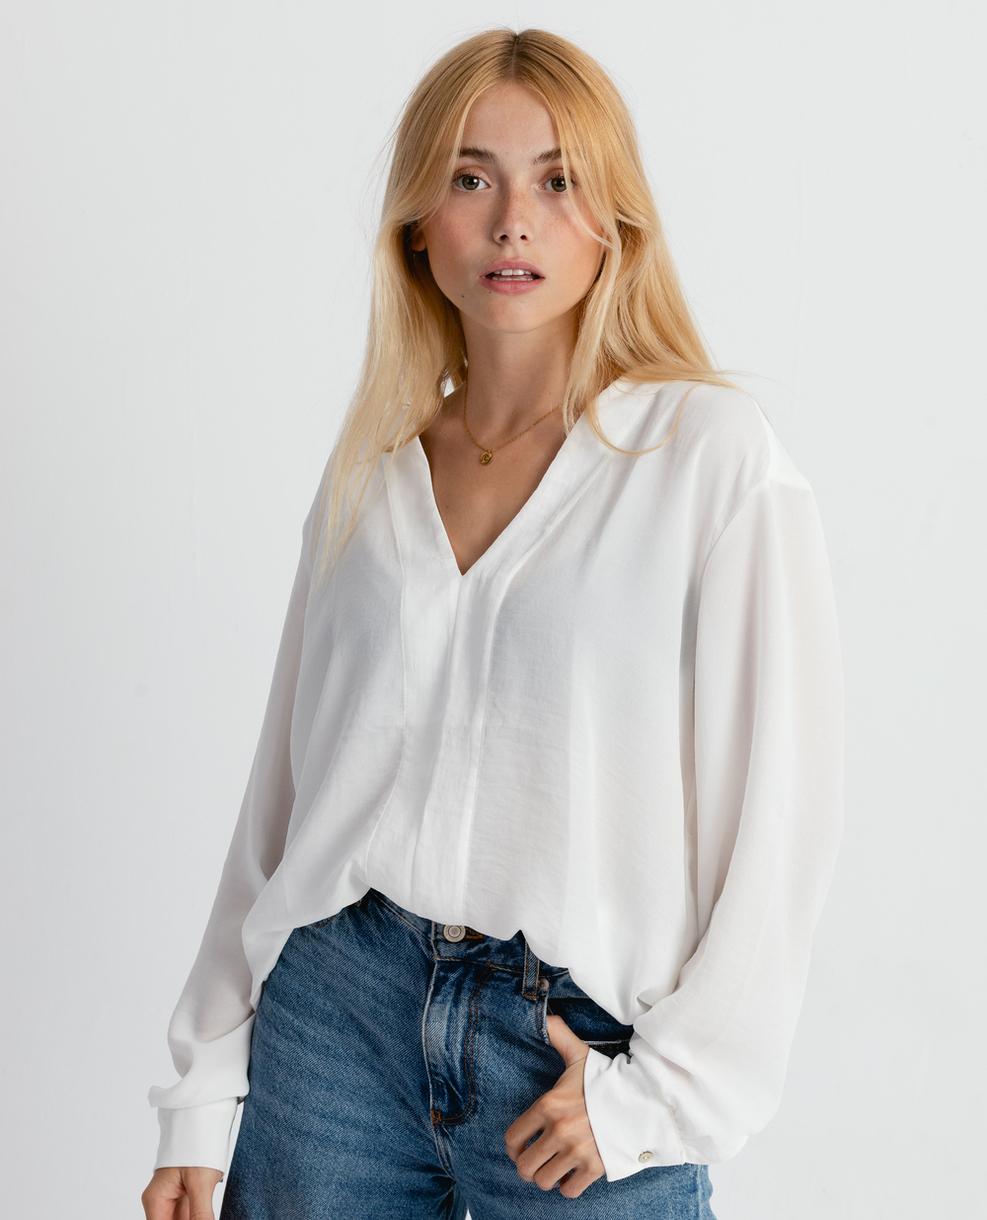 /b/l/blouse_8.jpg